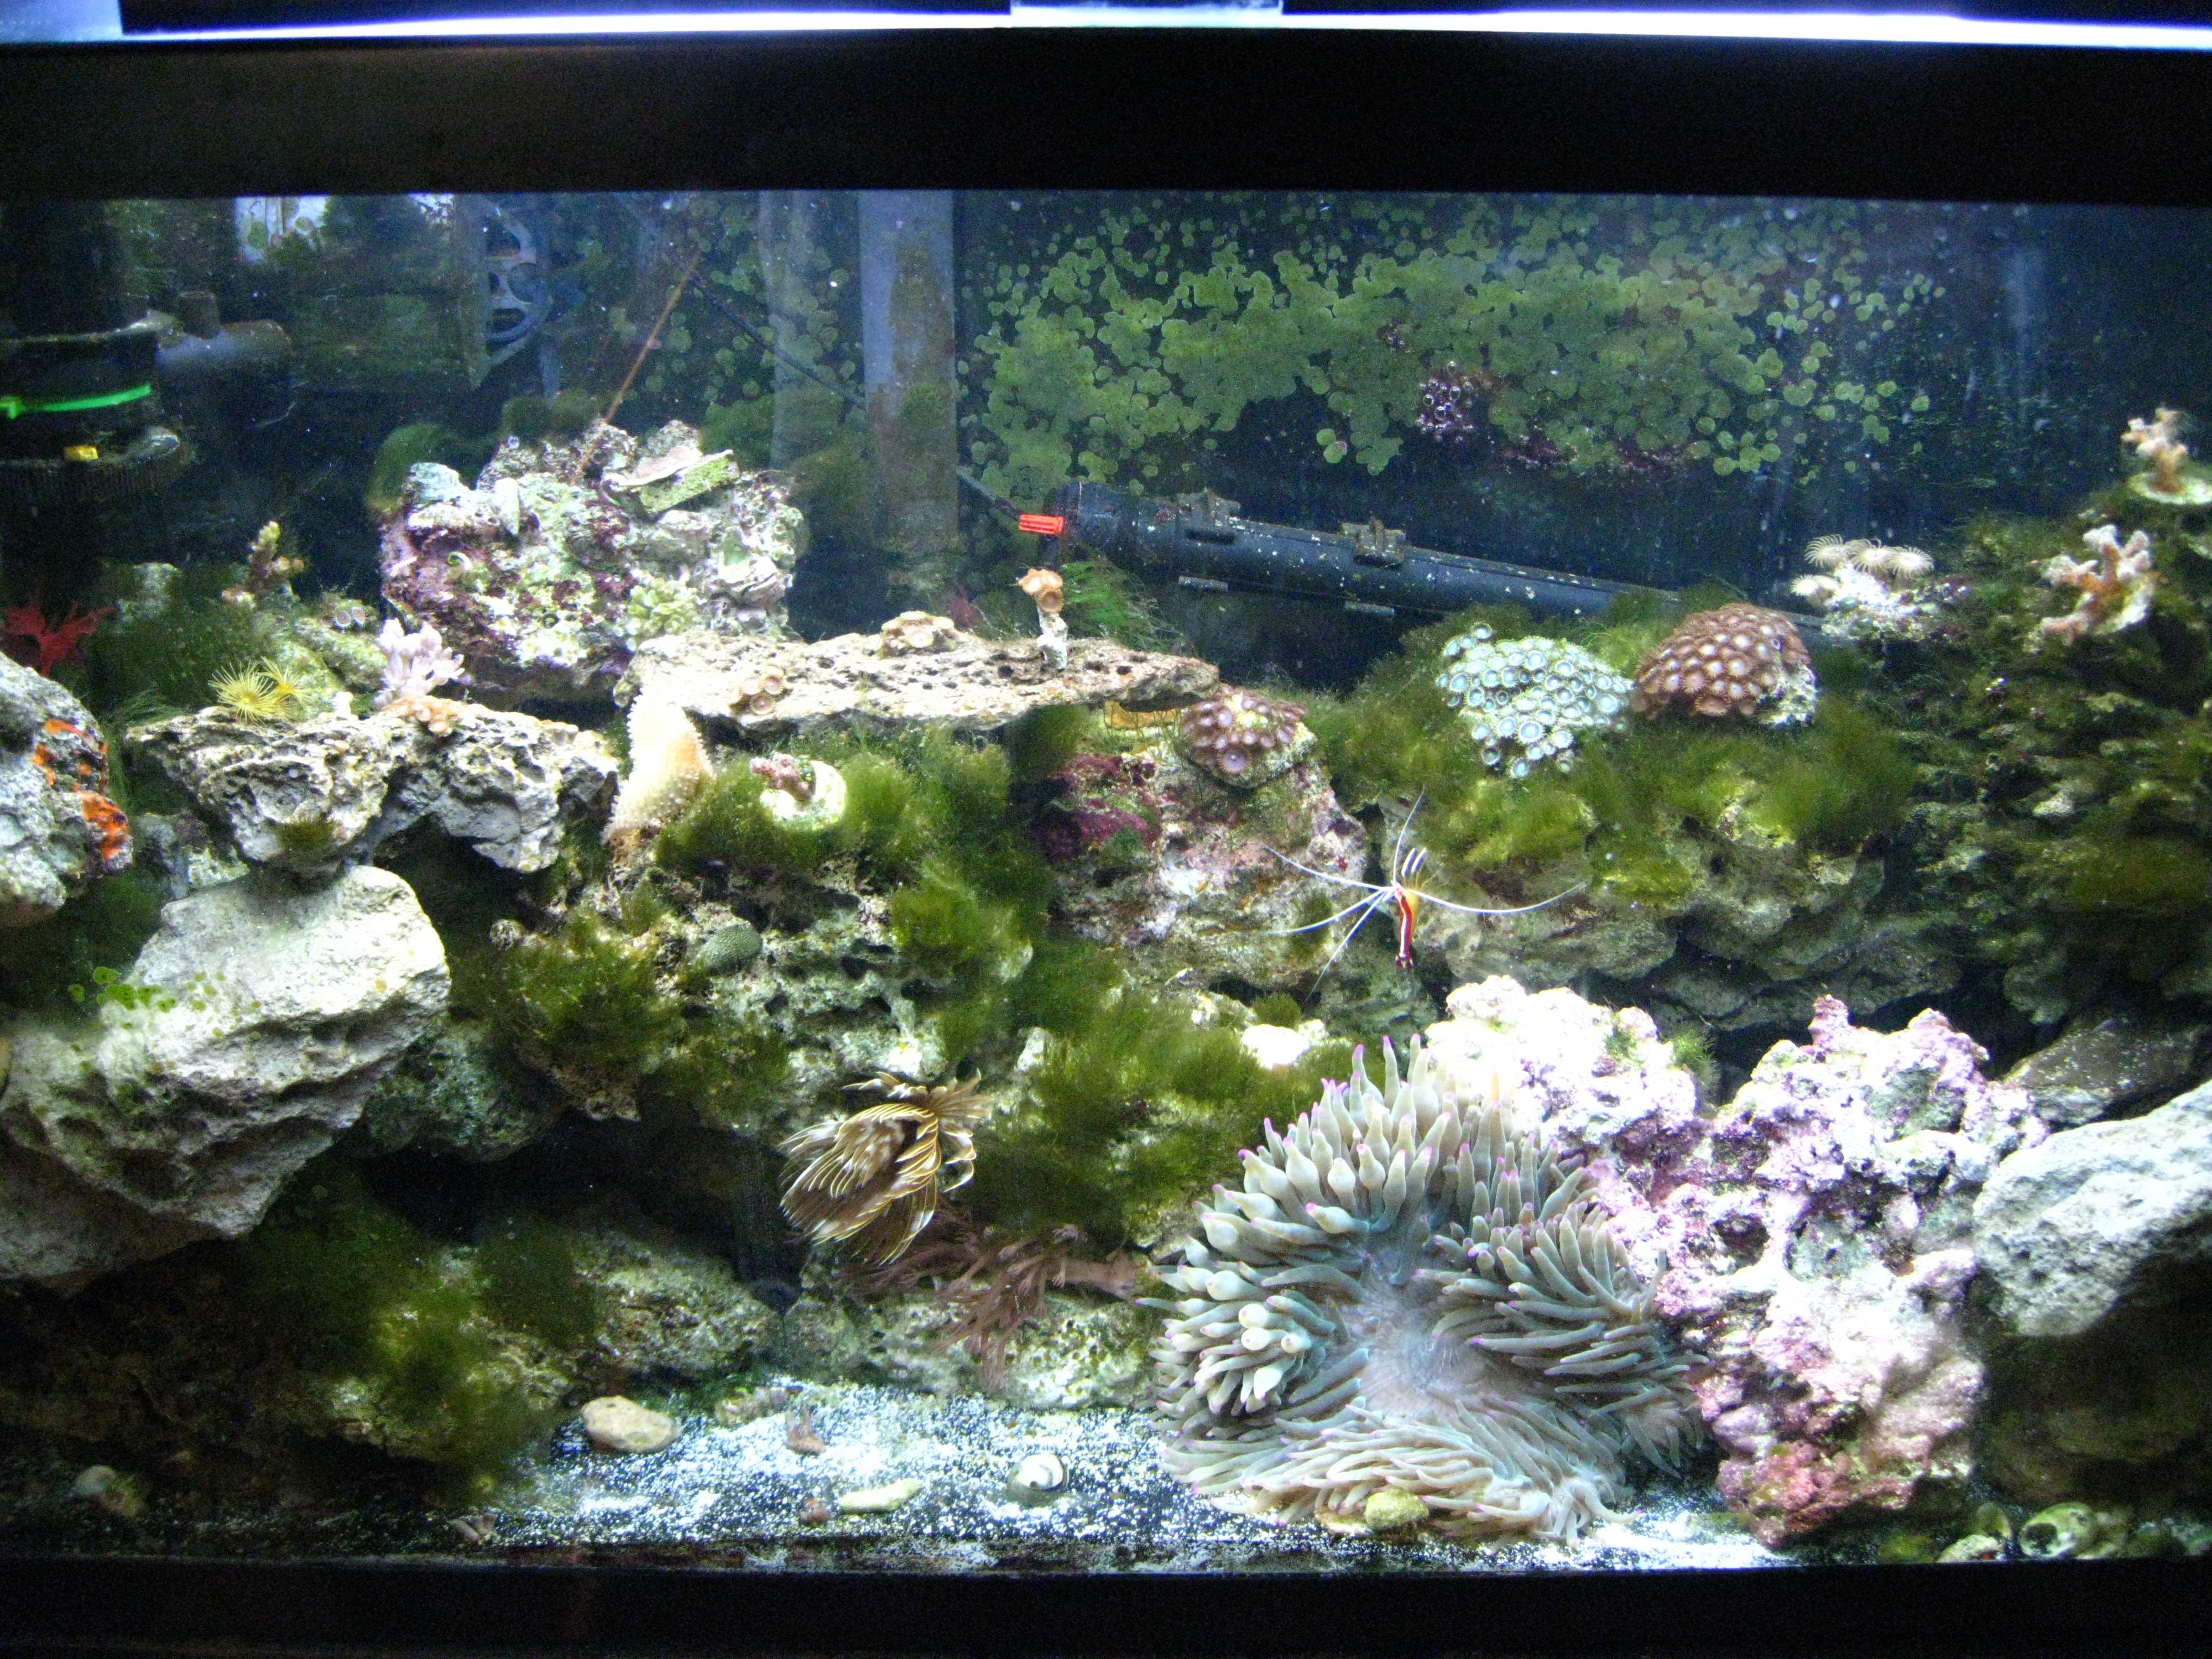 Freshwater aquarium fish no heater - The Beginning